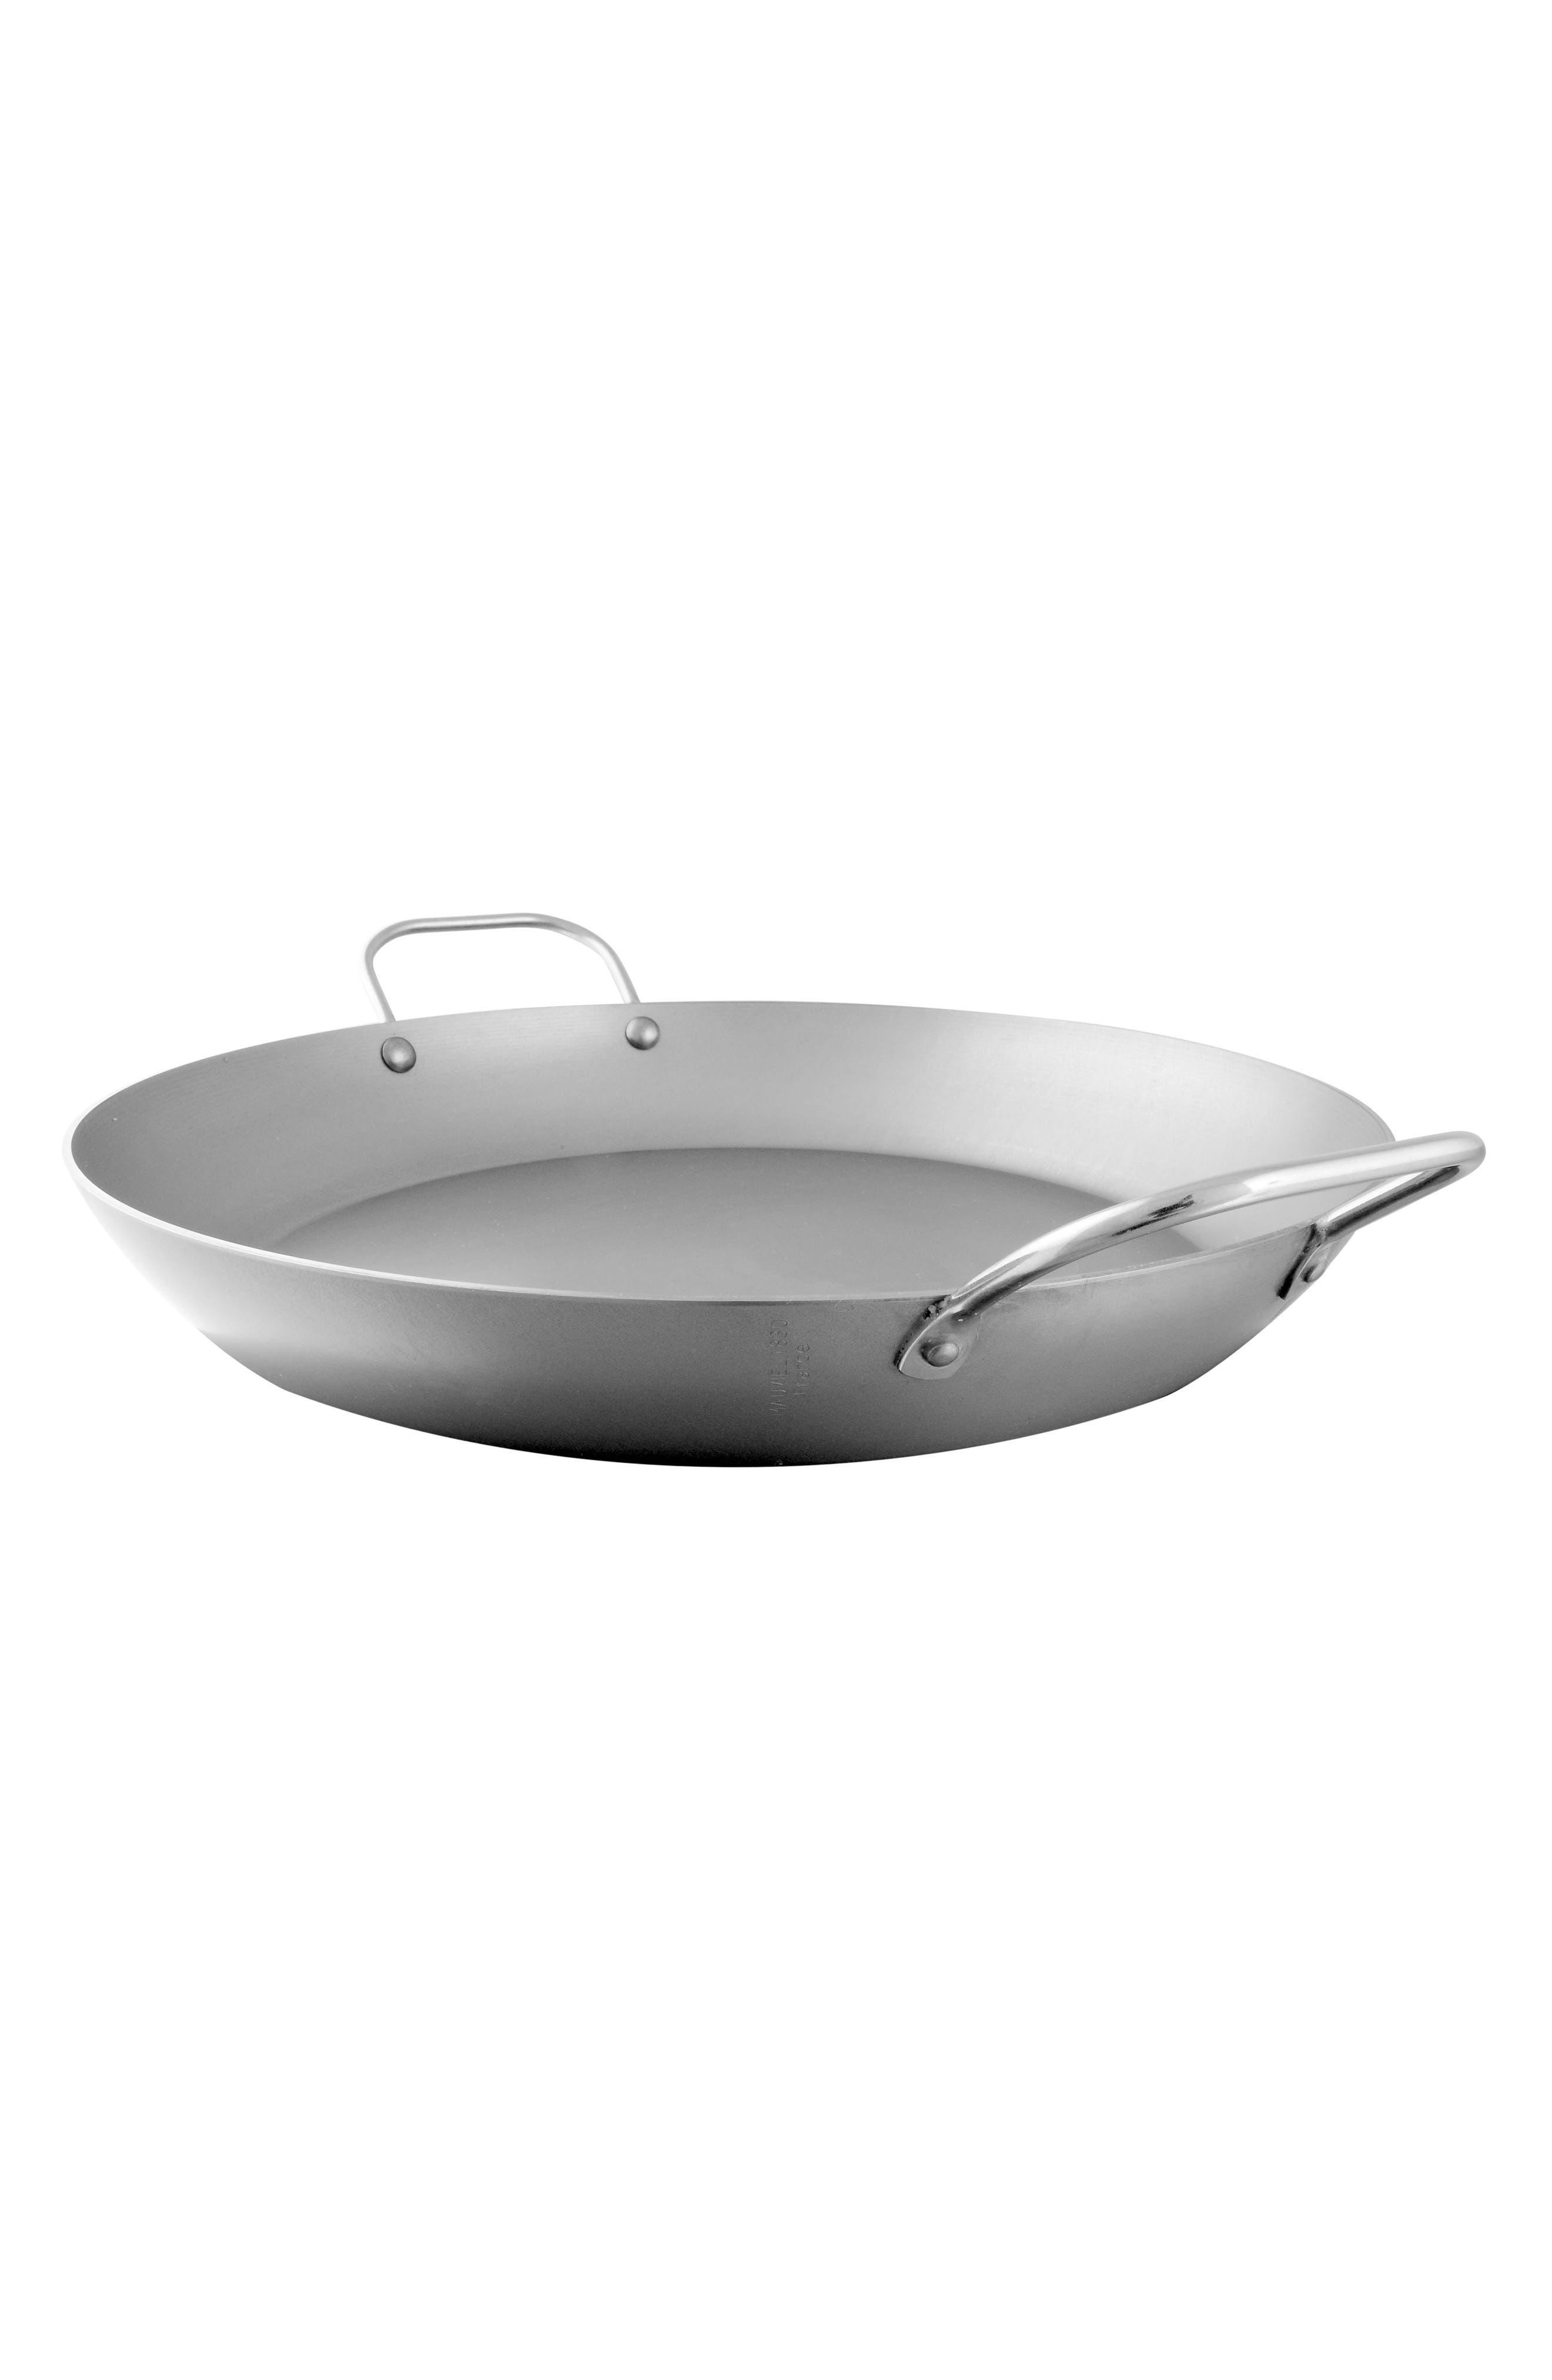 Mauviel M'steel Carbon Steel Paella Pan